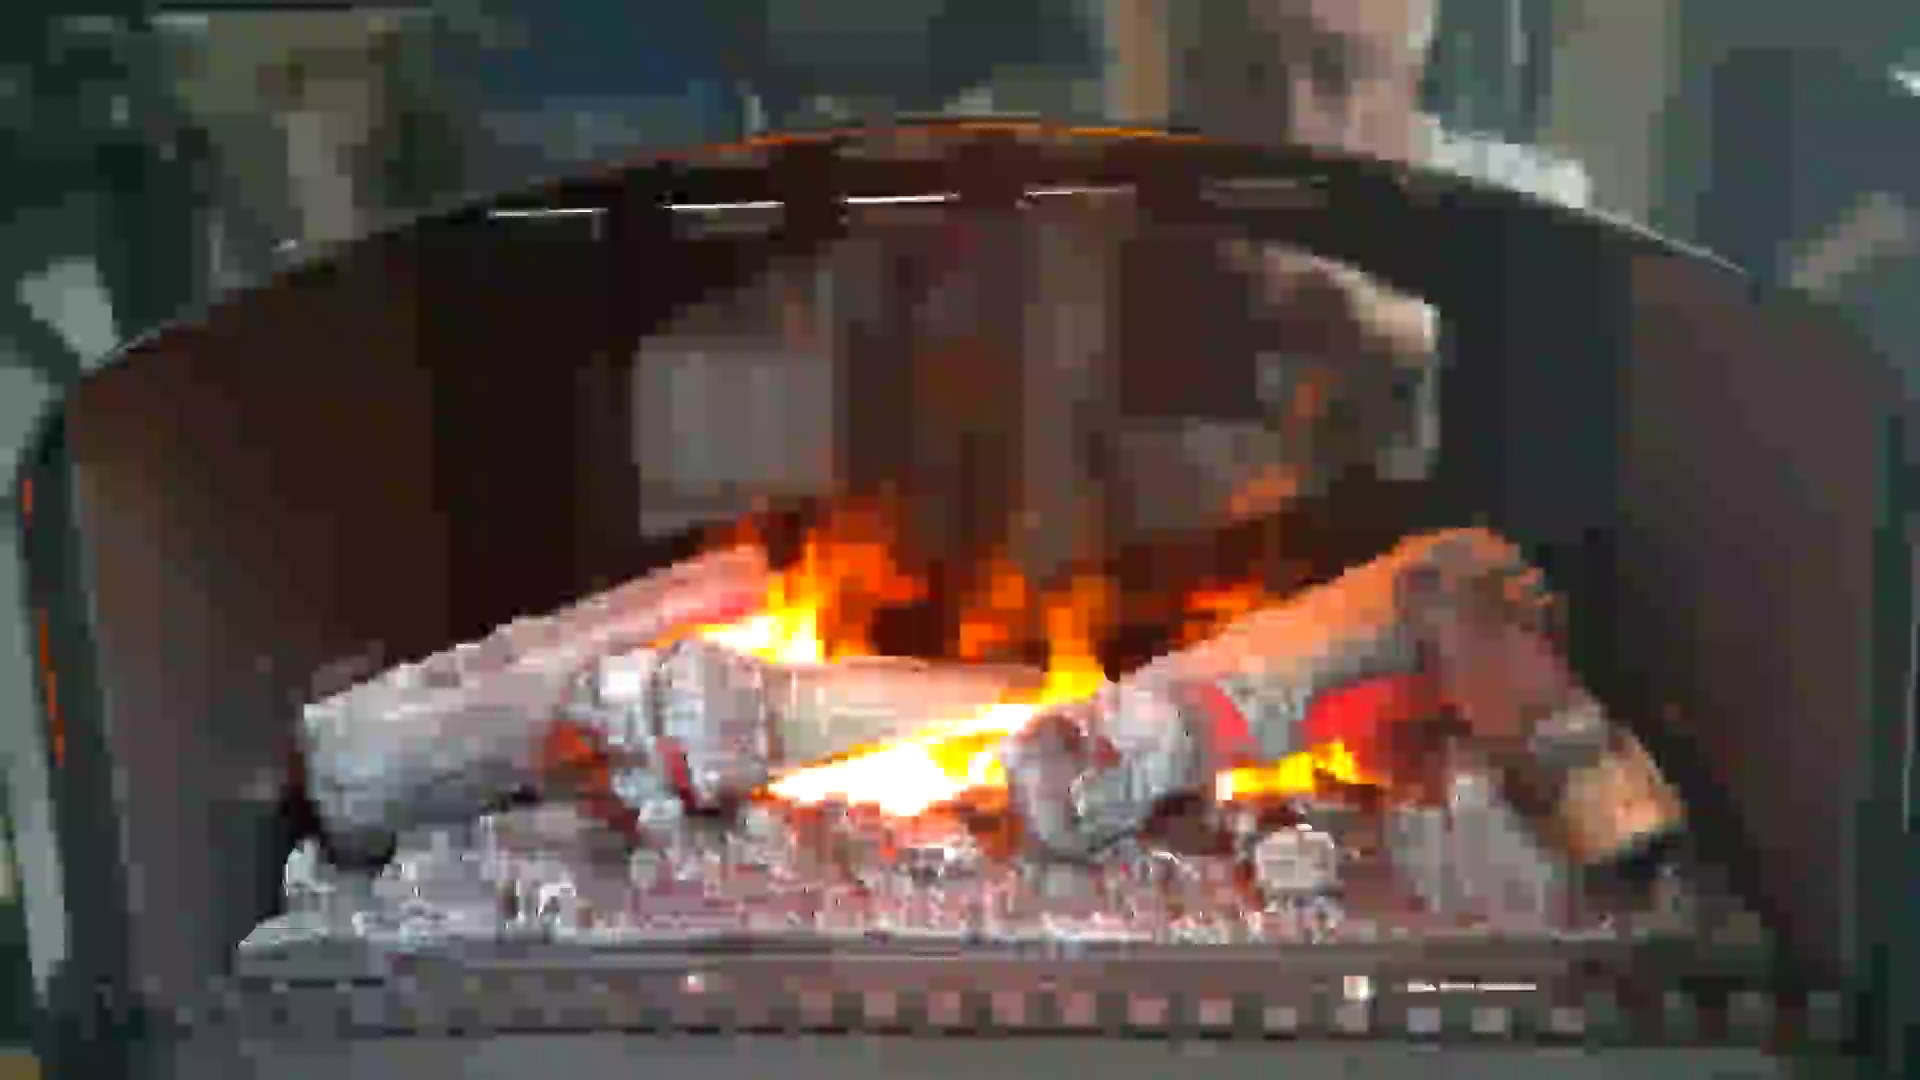 dimplex burgate brg20 optimyst black electric stove remote control